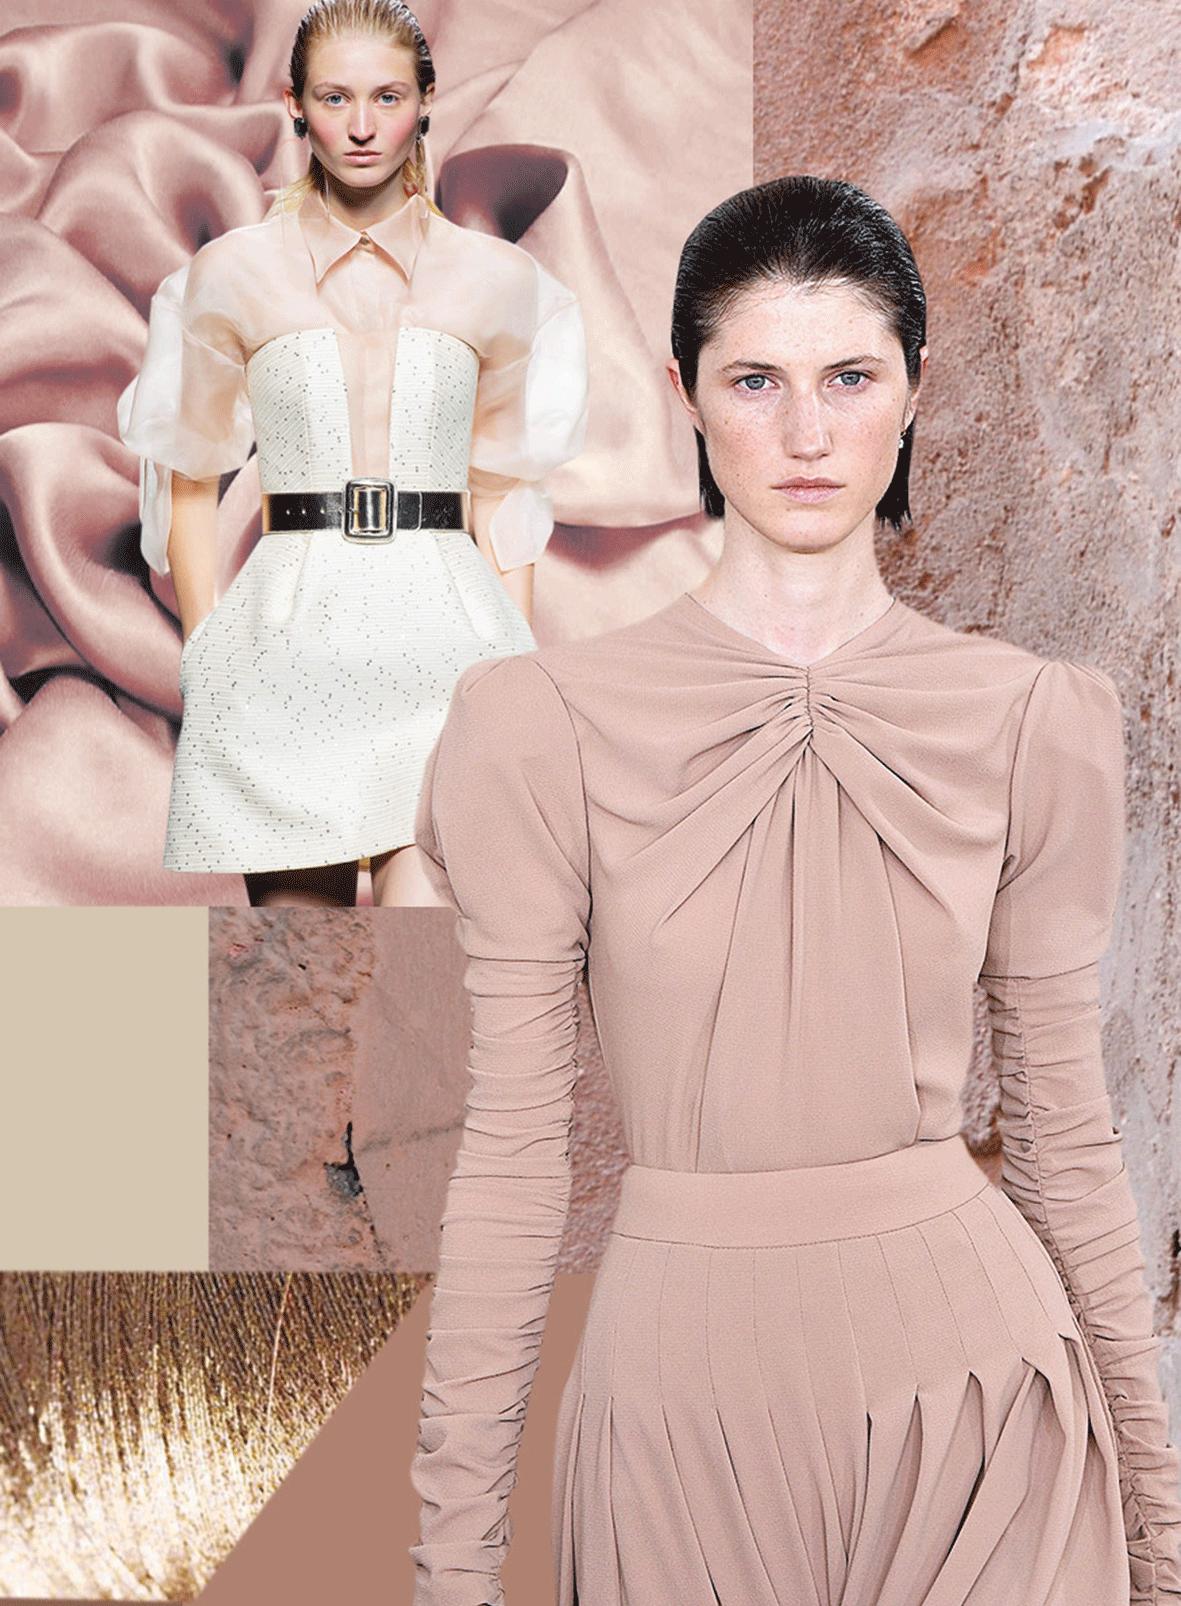 Mode in der Trendfarbe Fluid Brown